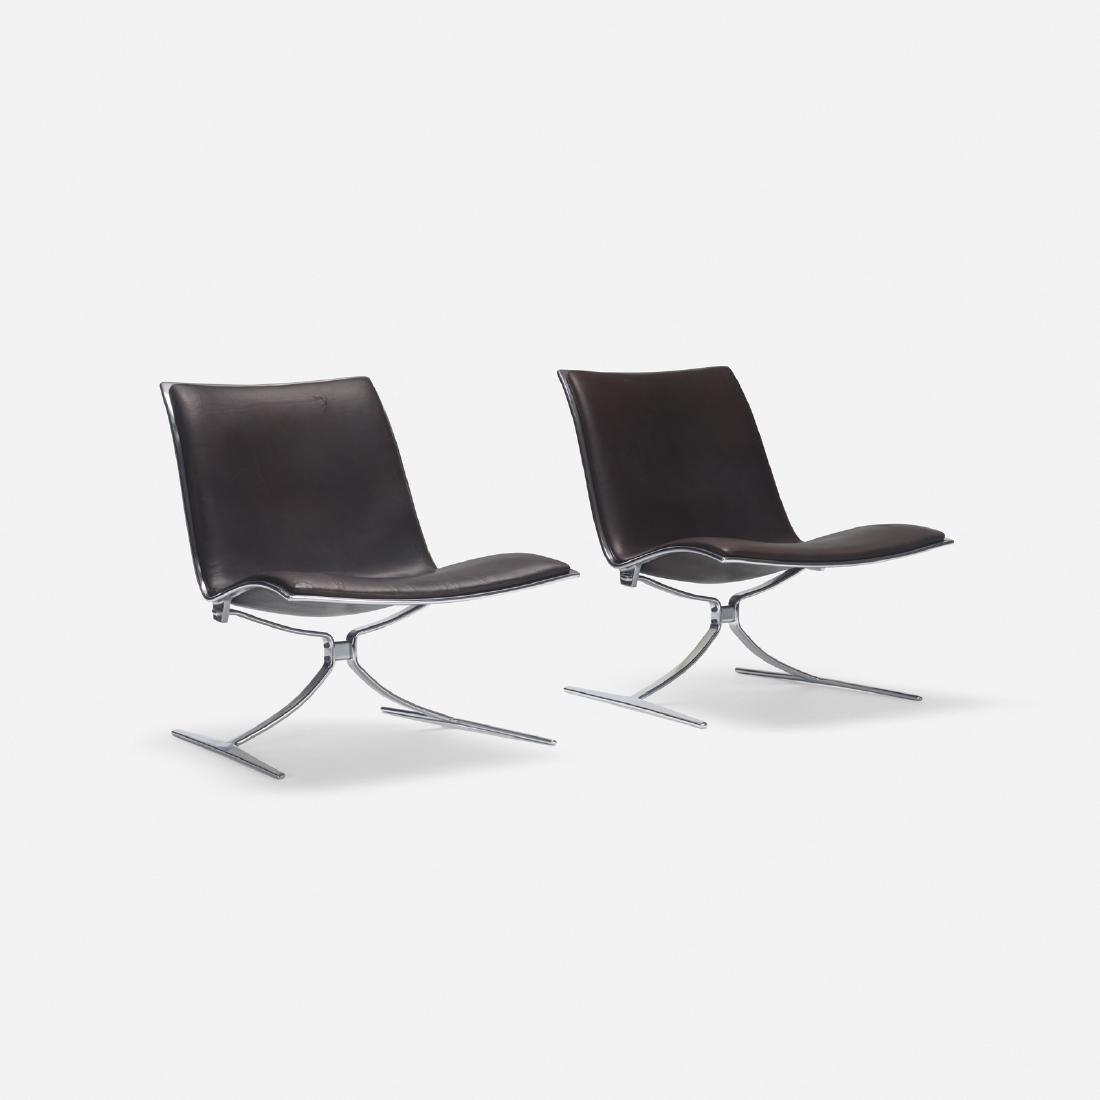 Jorgen Kastholm, Skater chairs, pair